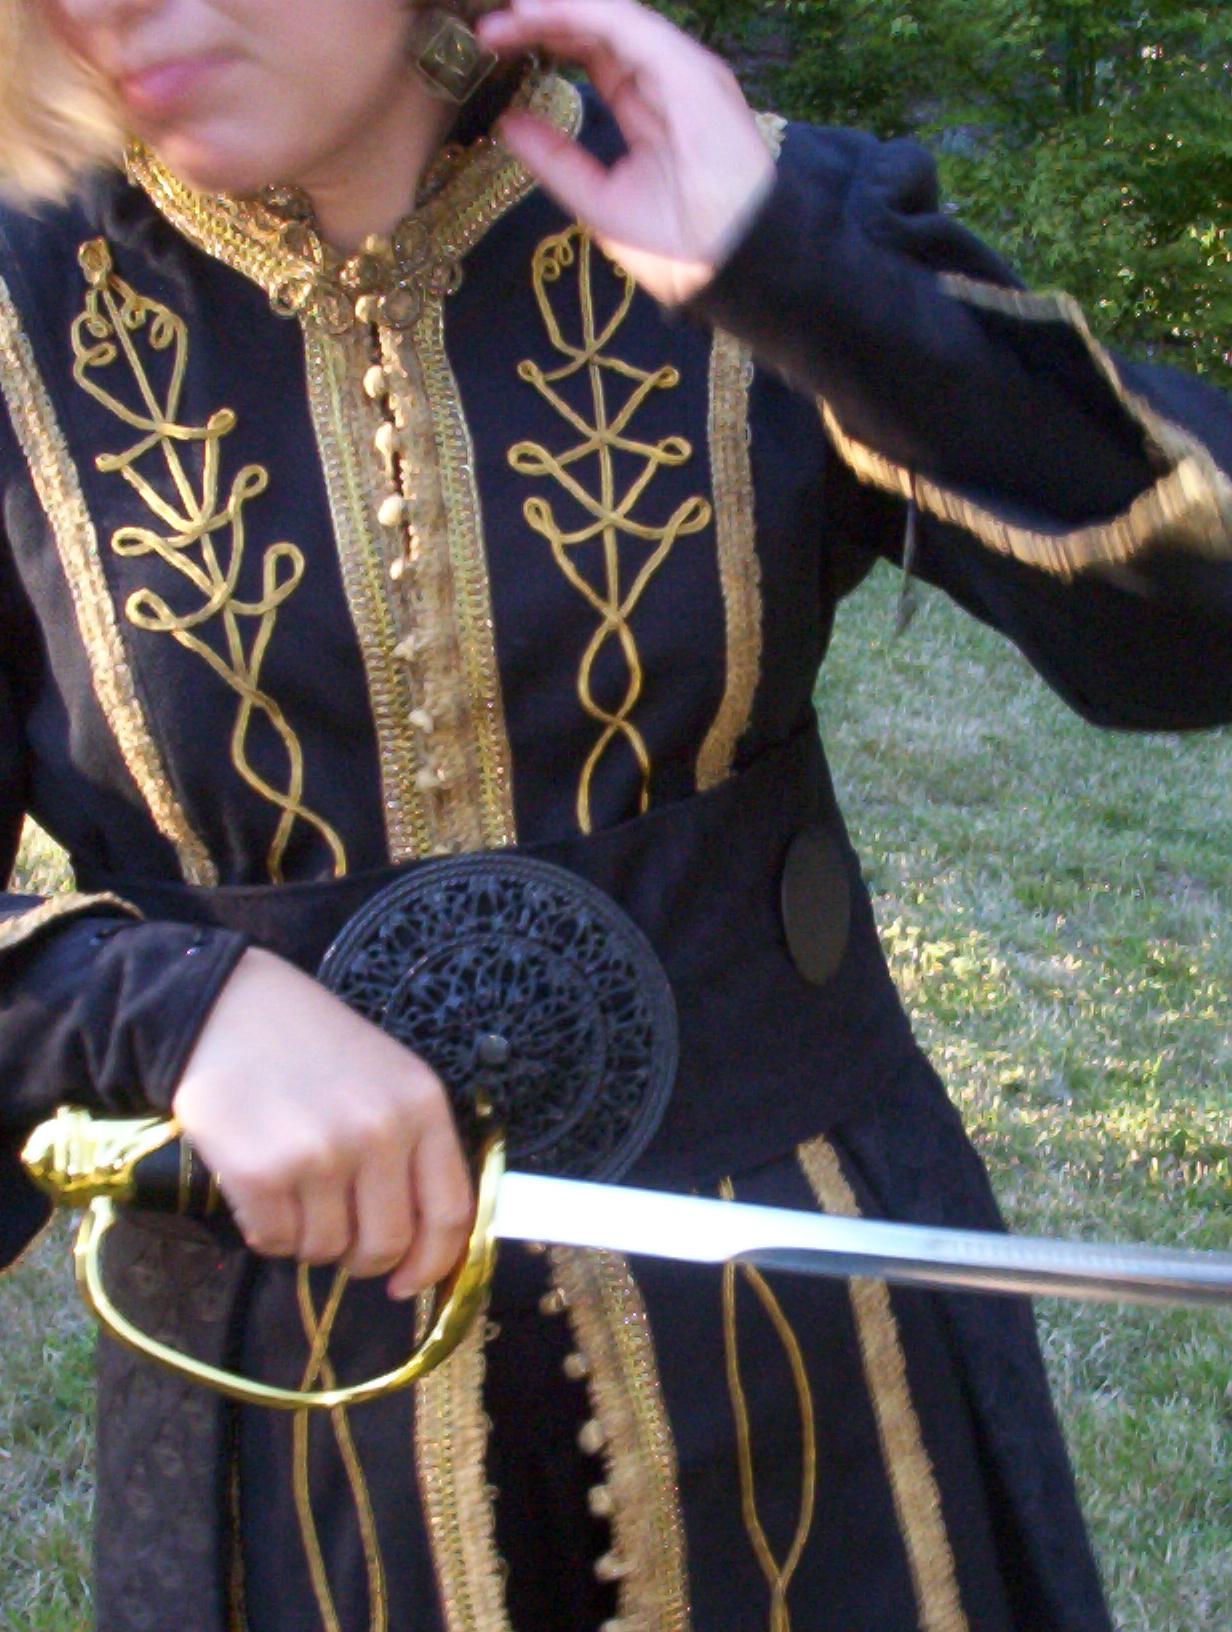 BlackGold Pirate Costume Bekah pics 045.jpg